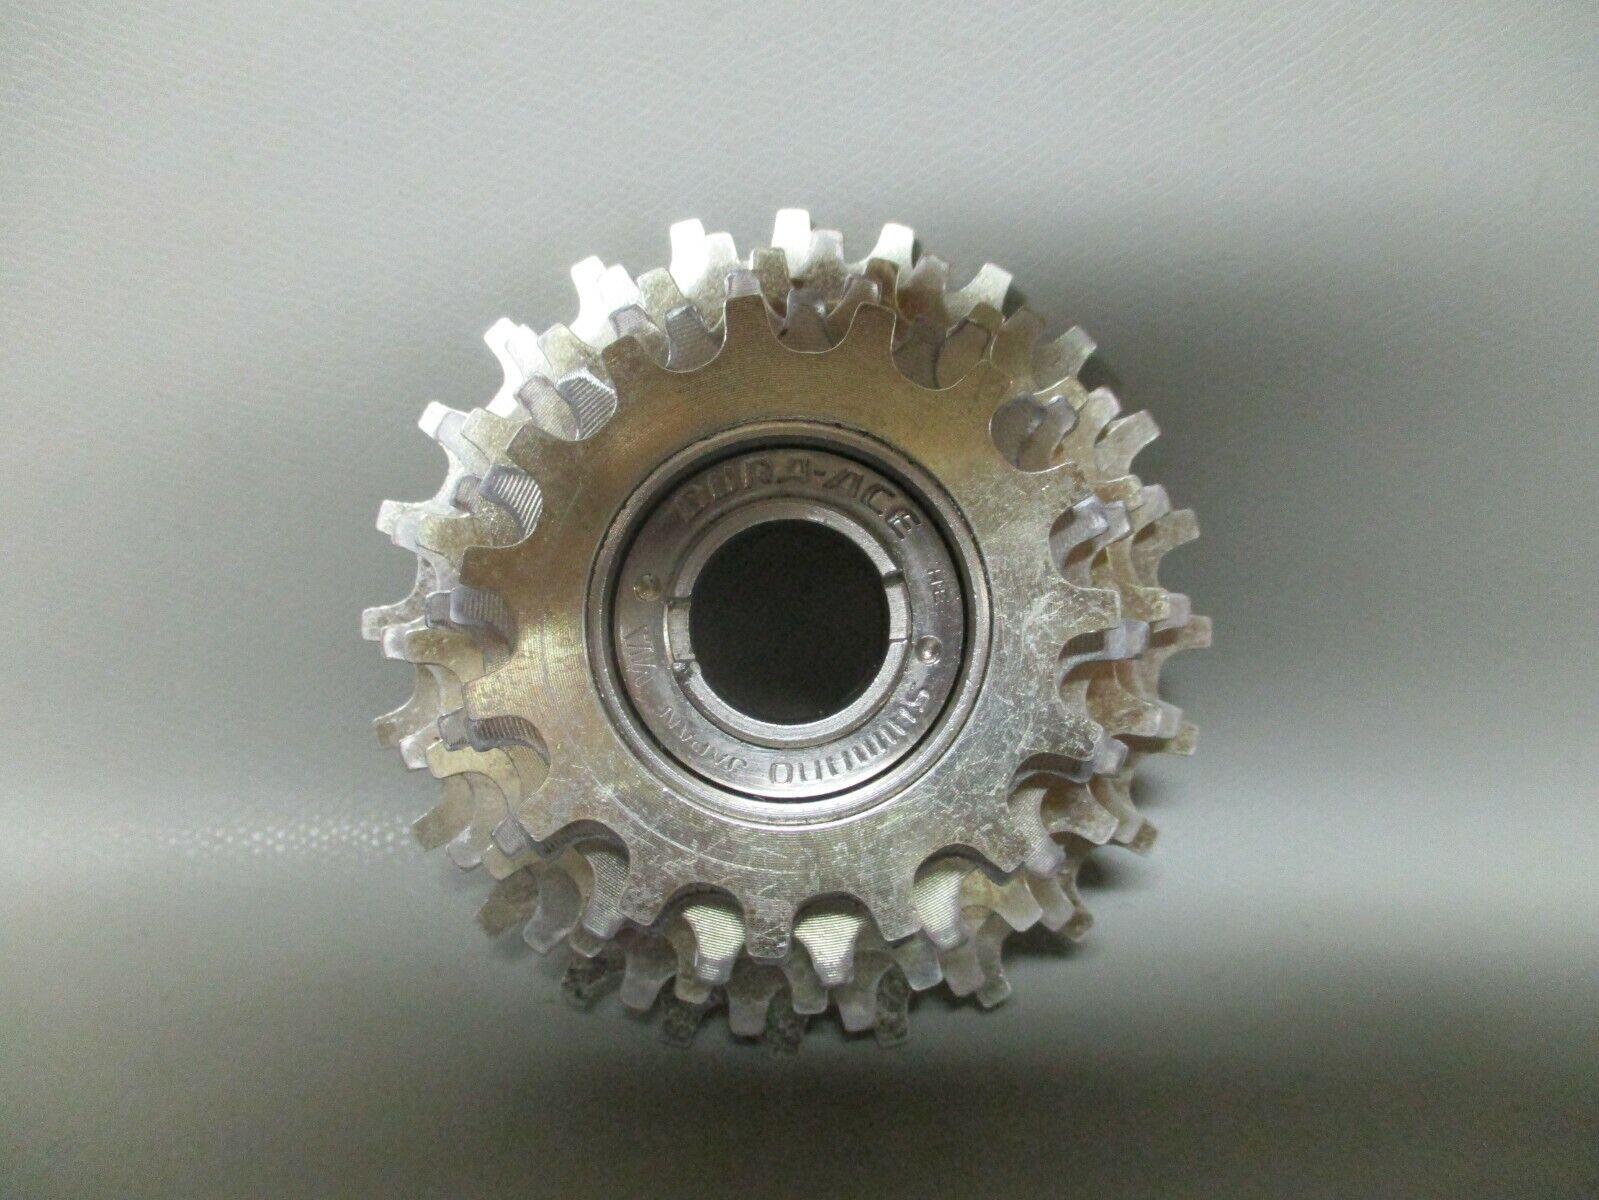 Shimano Dura Ace EX freewheel - 6 speed - 15-24T - 6s - VGC